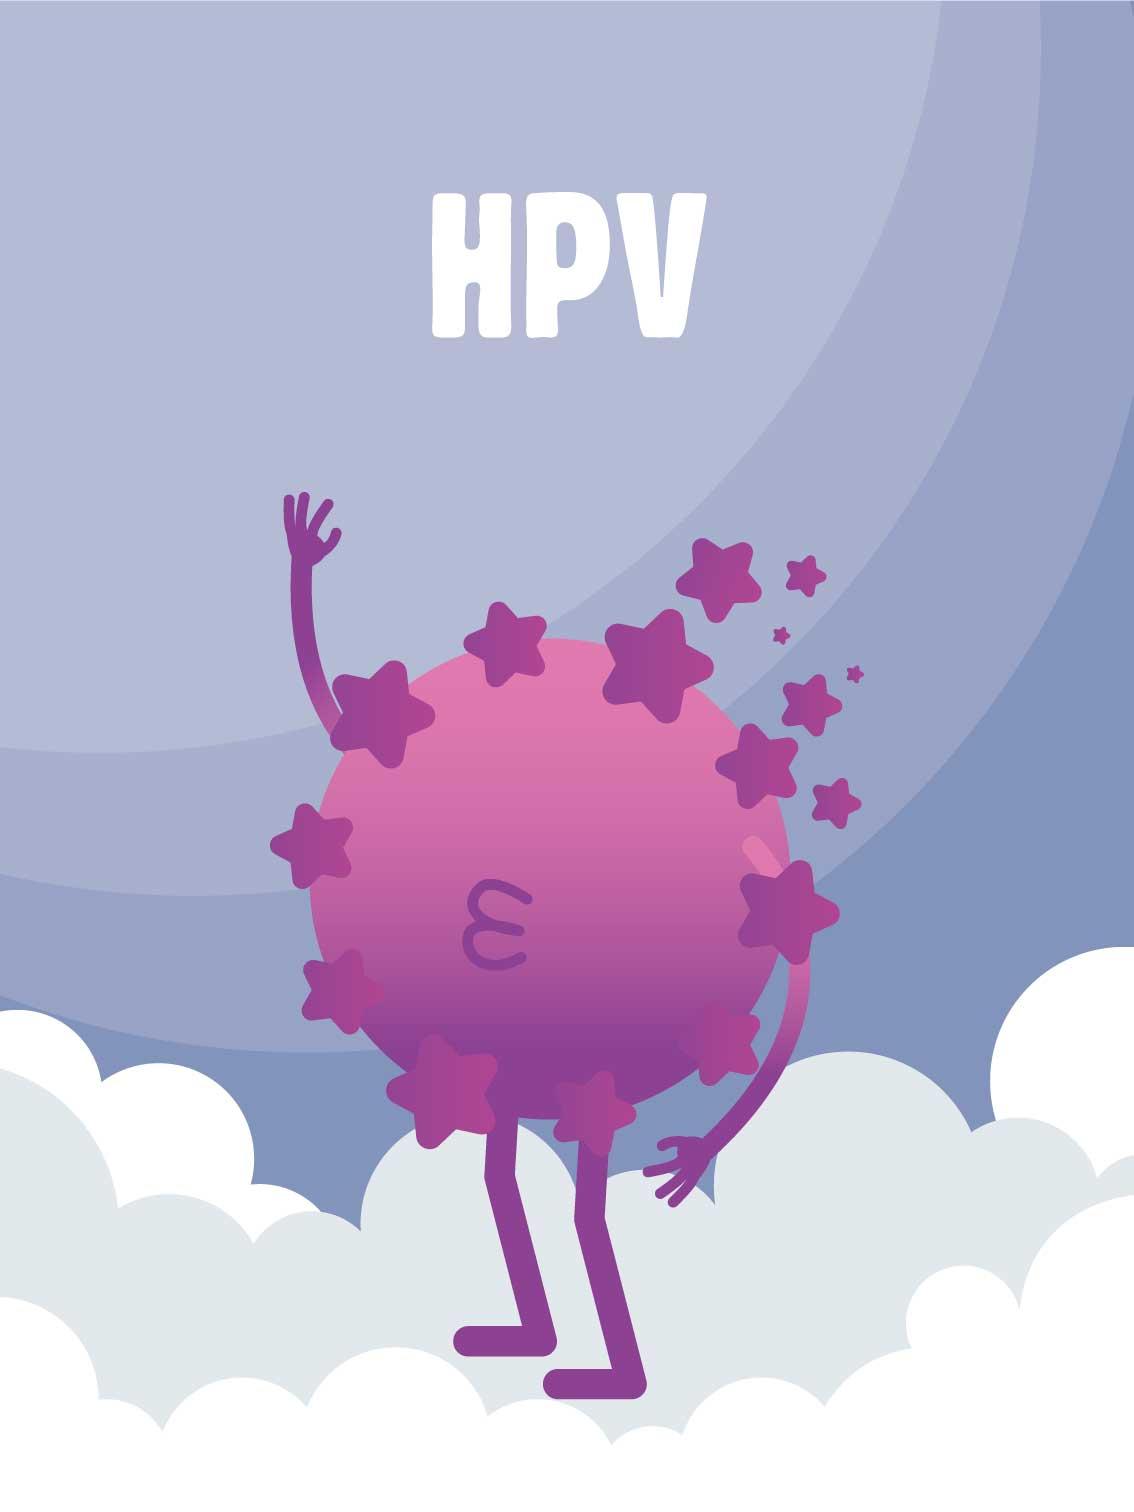 risques papillomavirus chez la femme papilloma virus genotipo 90